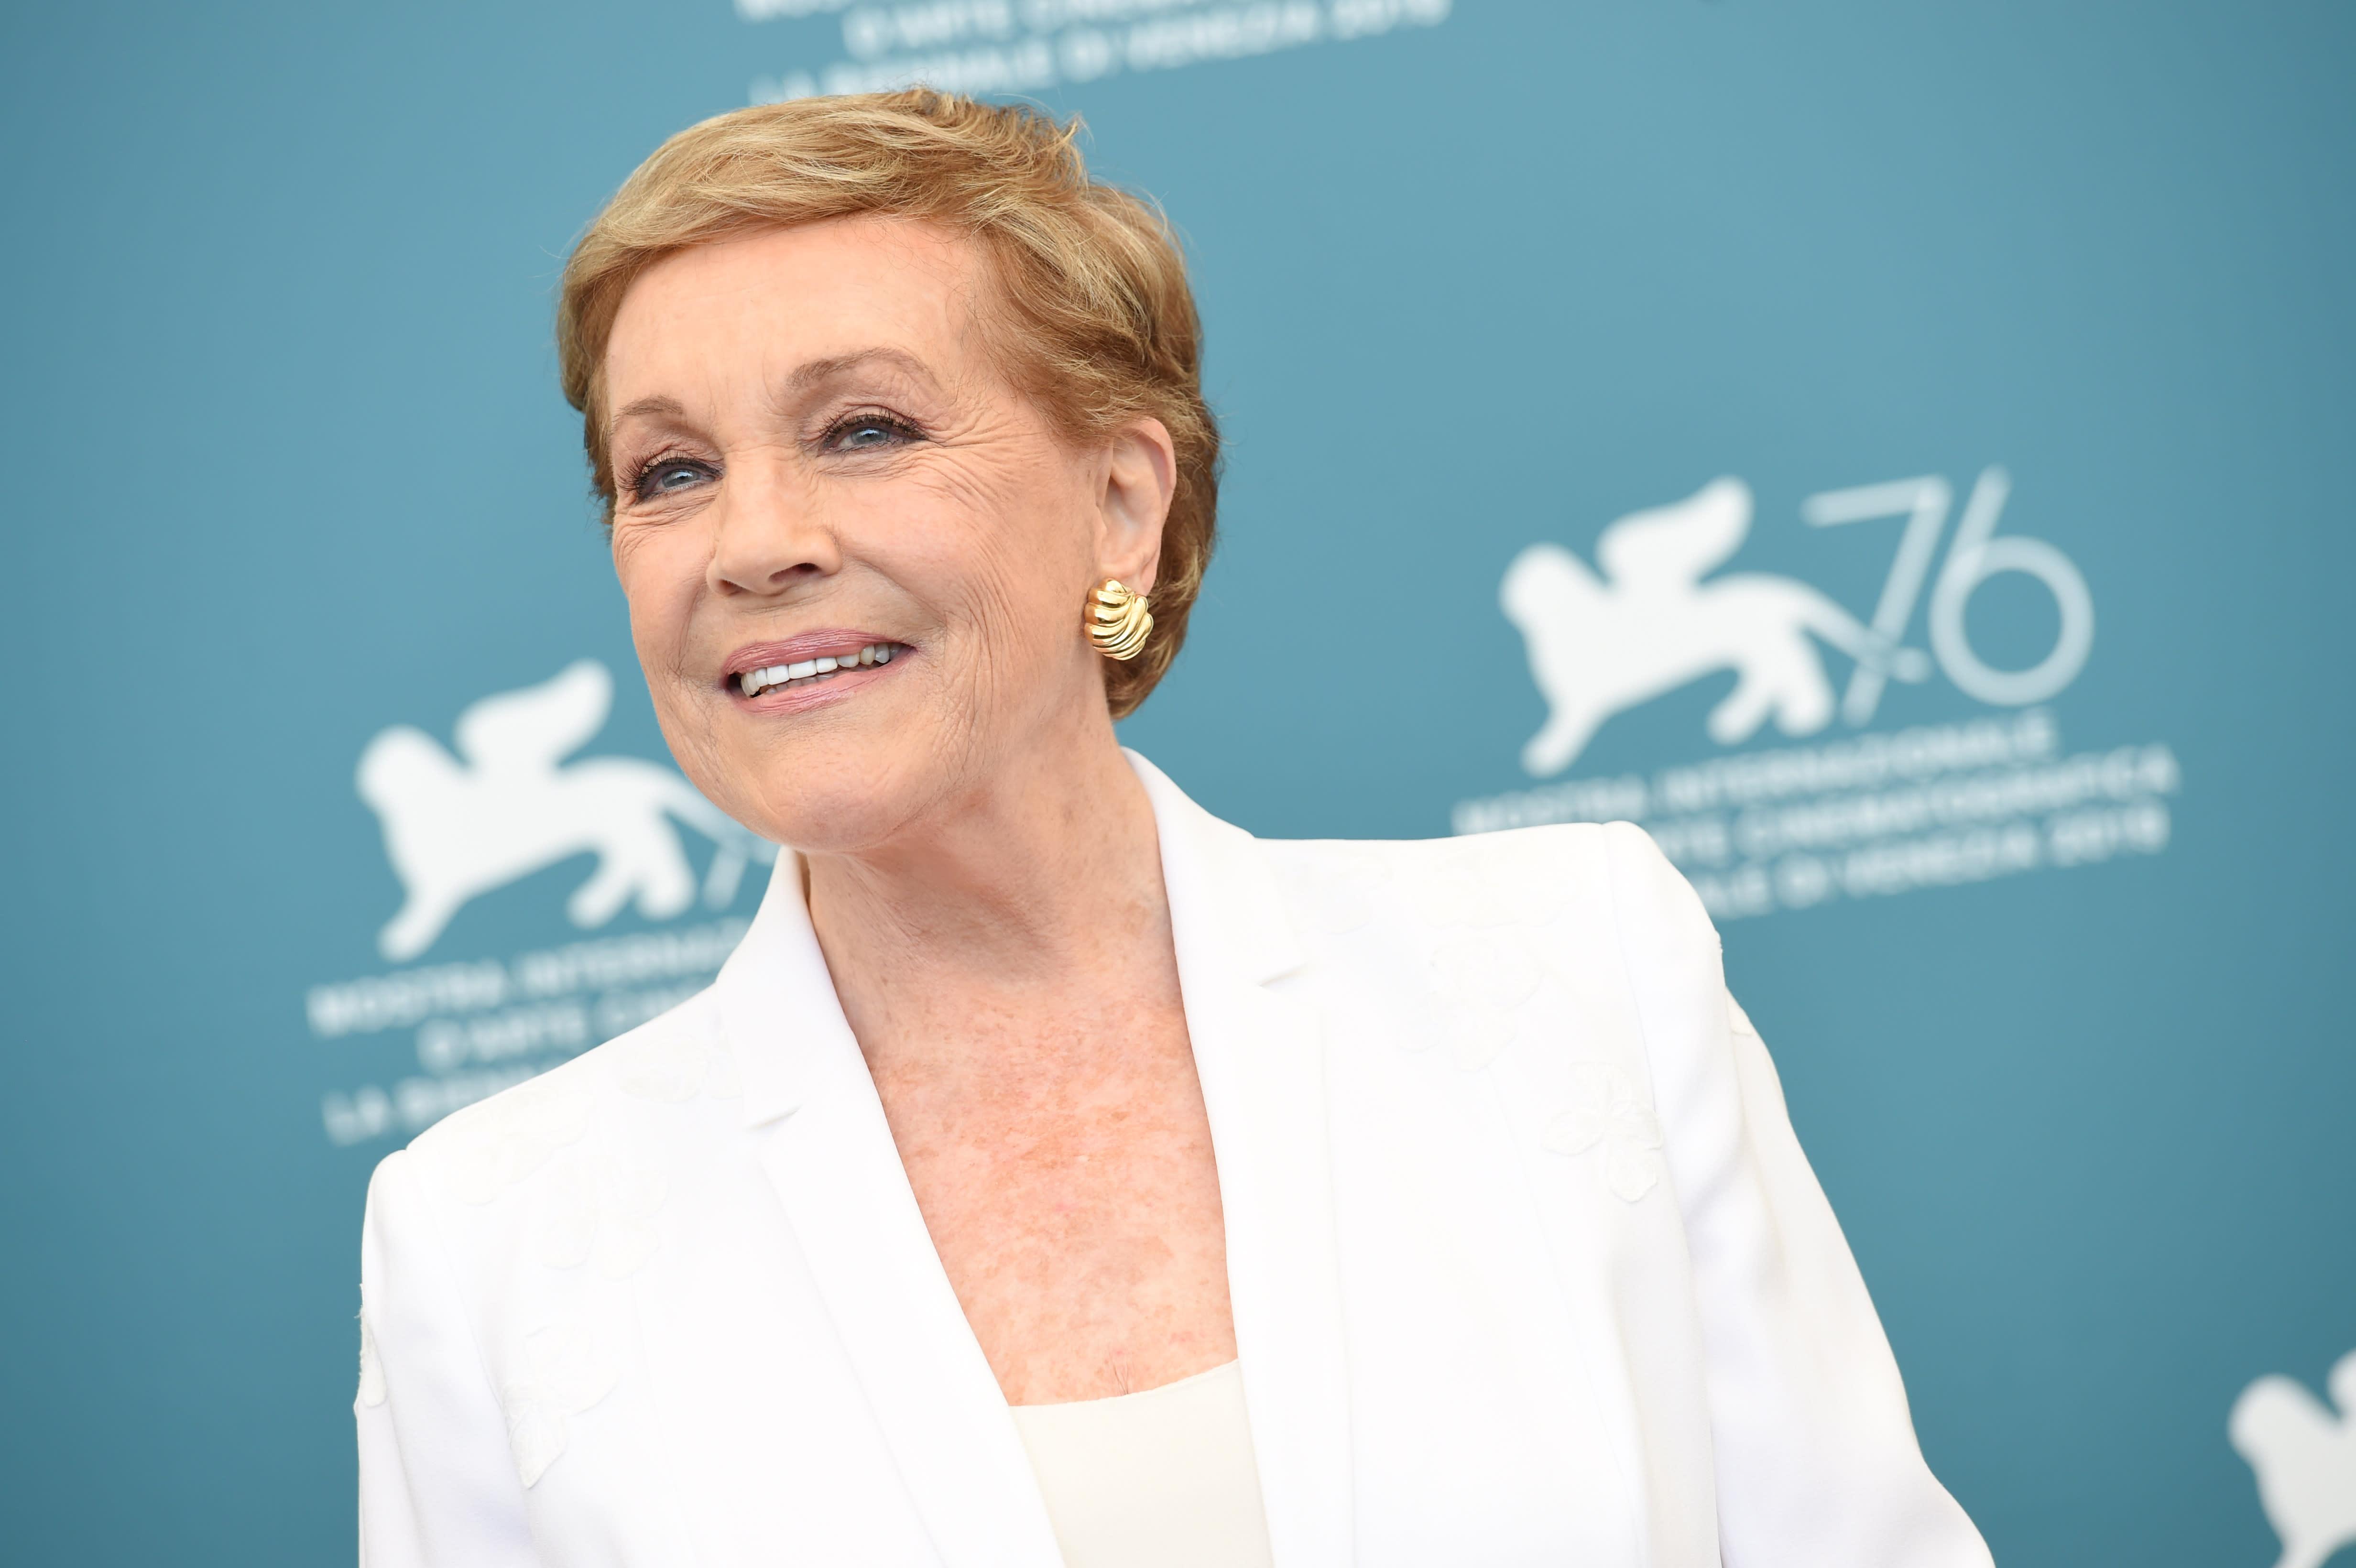 Julie Andrews offers uplifting coronavirus message